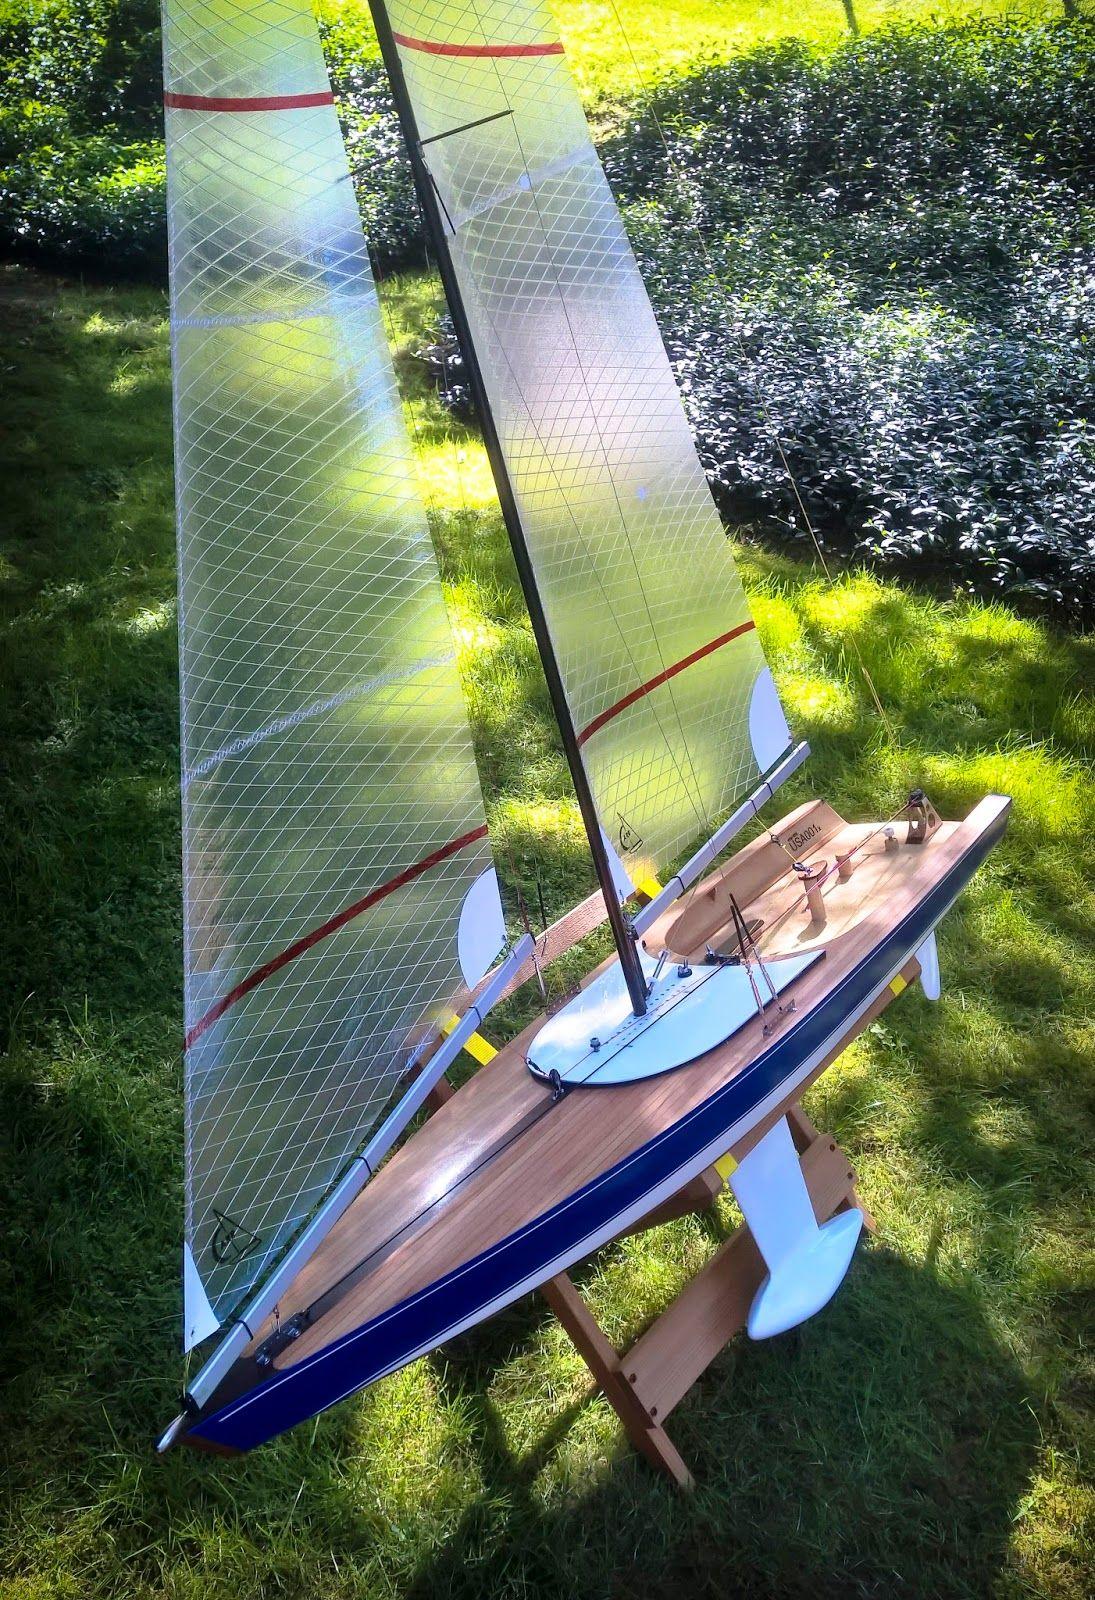 Salish 475 RC Sailboat Star 45 rc sailboat | Rc Sailboat